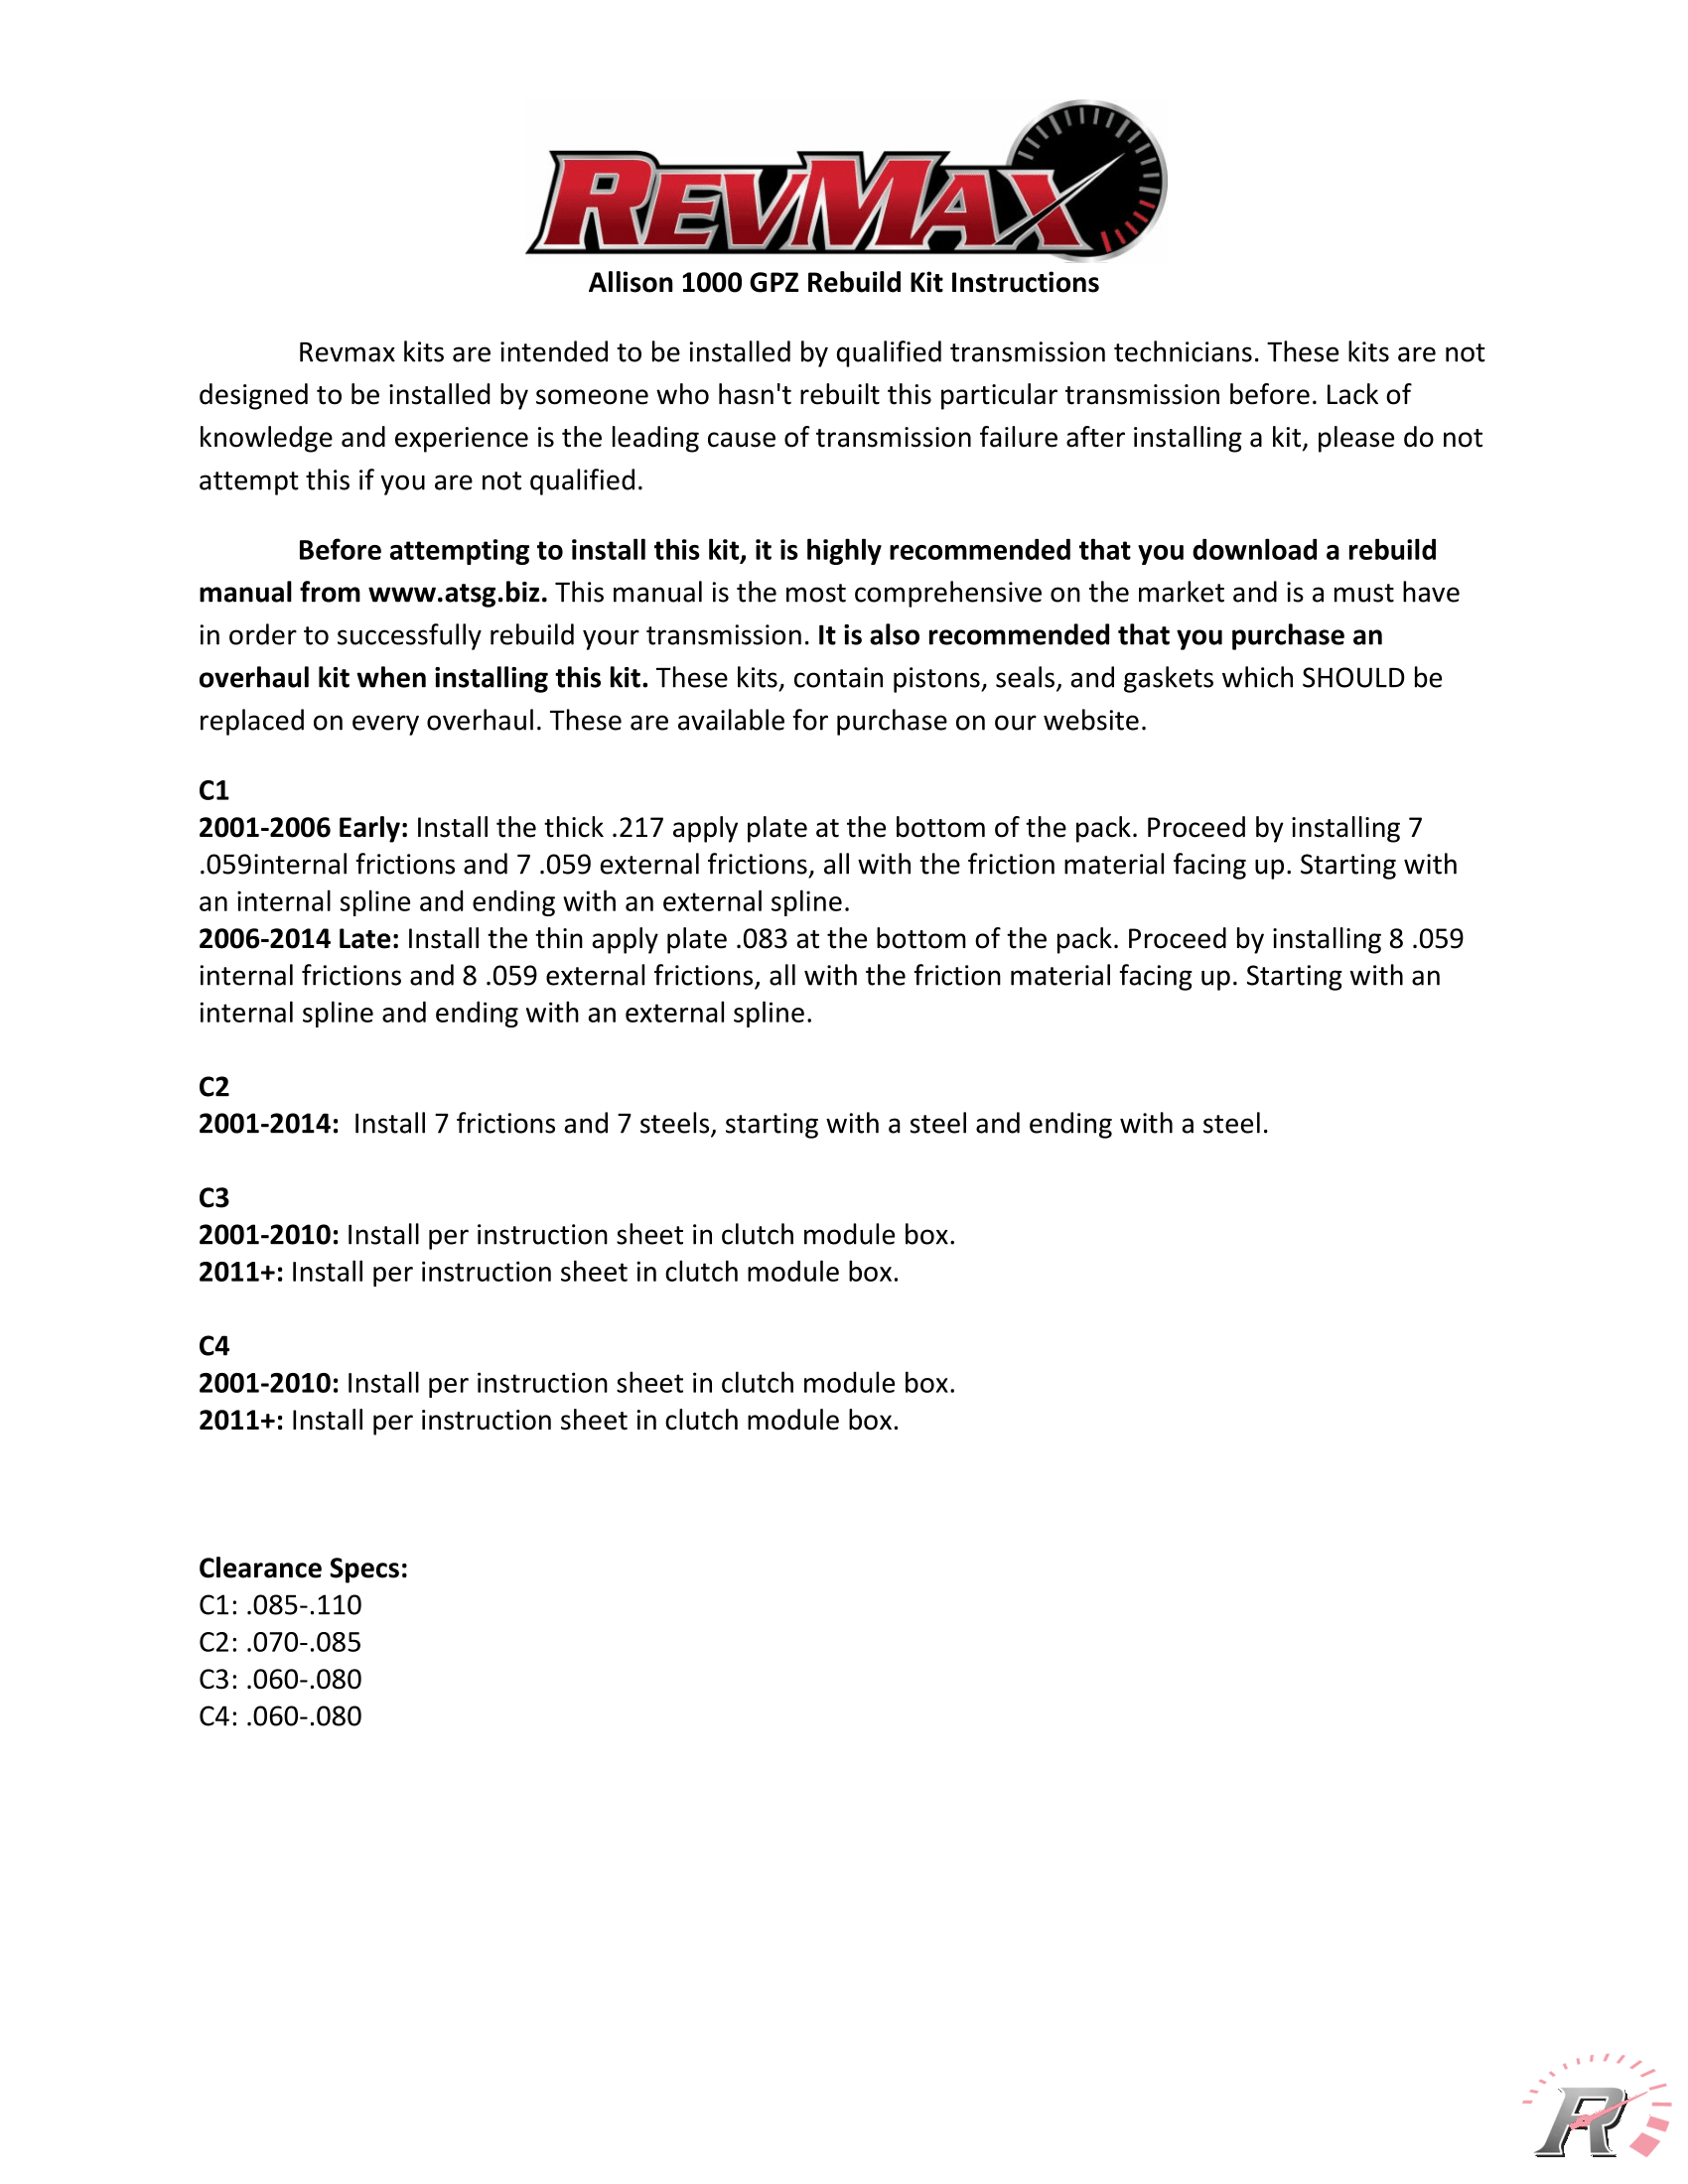 allison1000rebuildkitinstructions-1